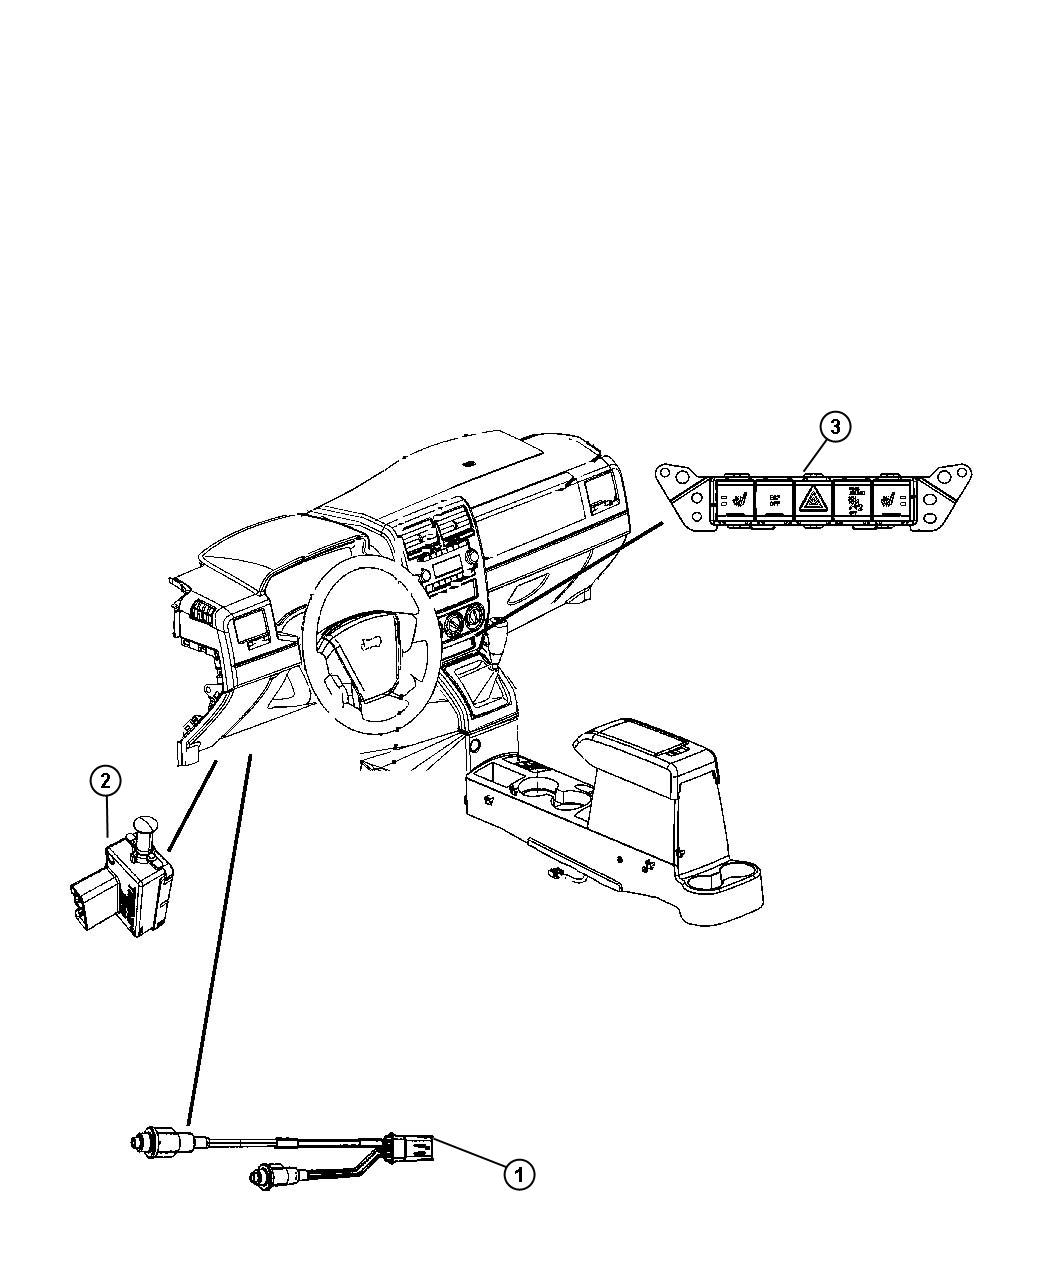 Jeep Compass Switch. Pod. Jkl, instrument, panel